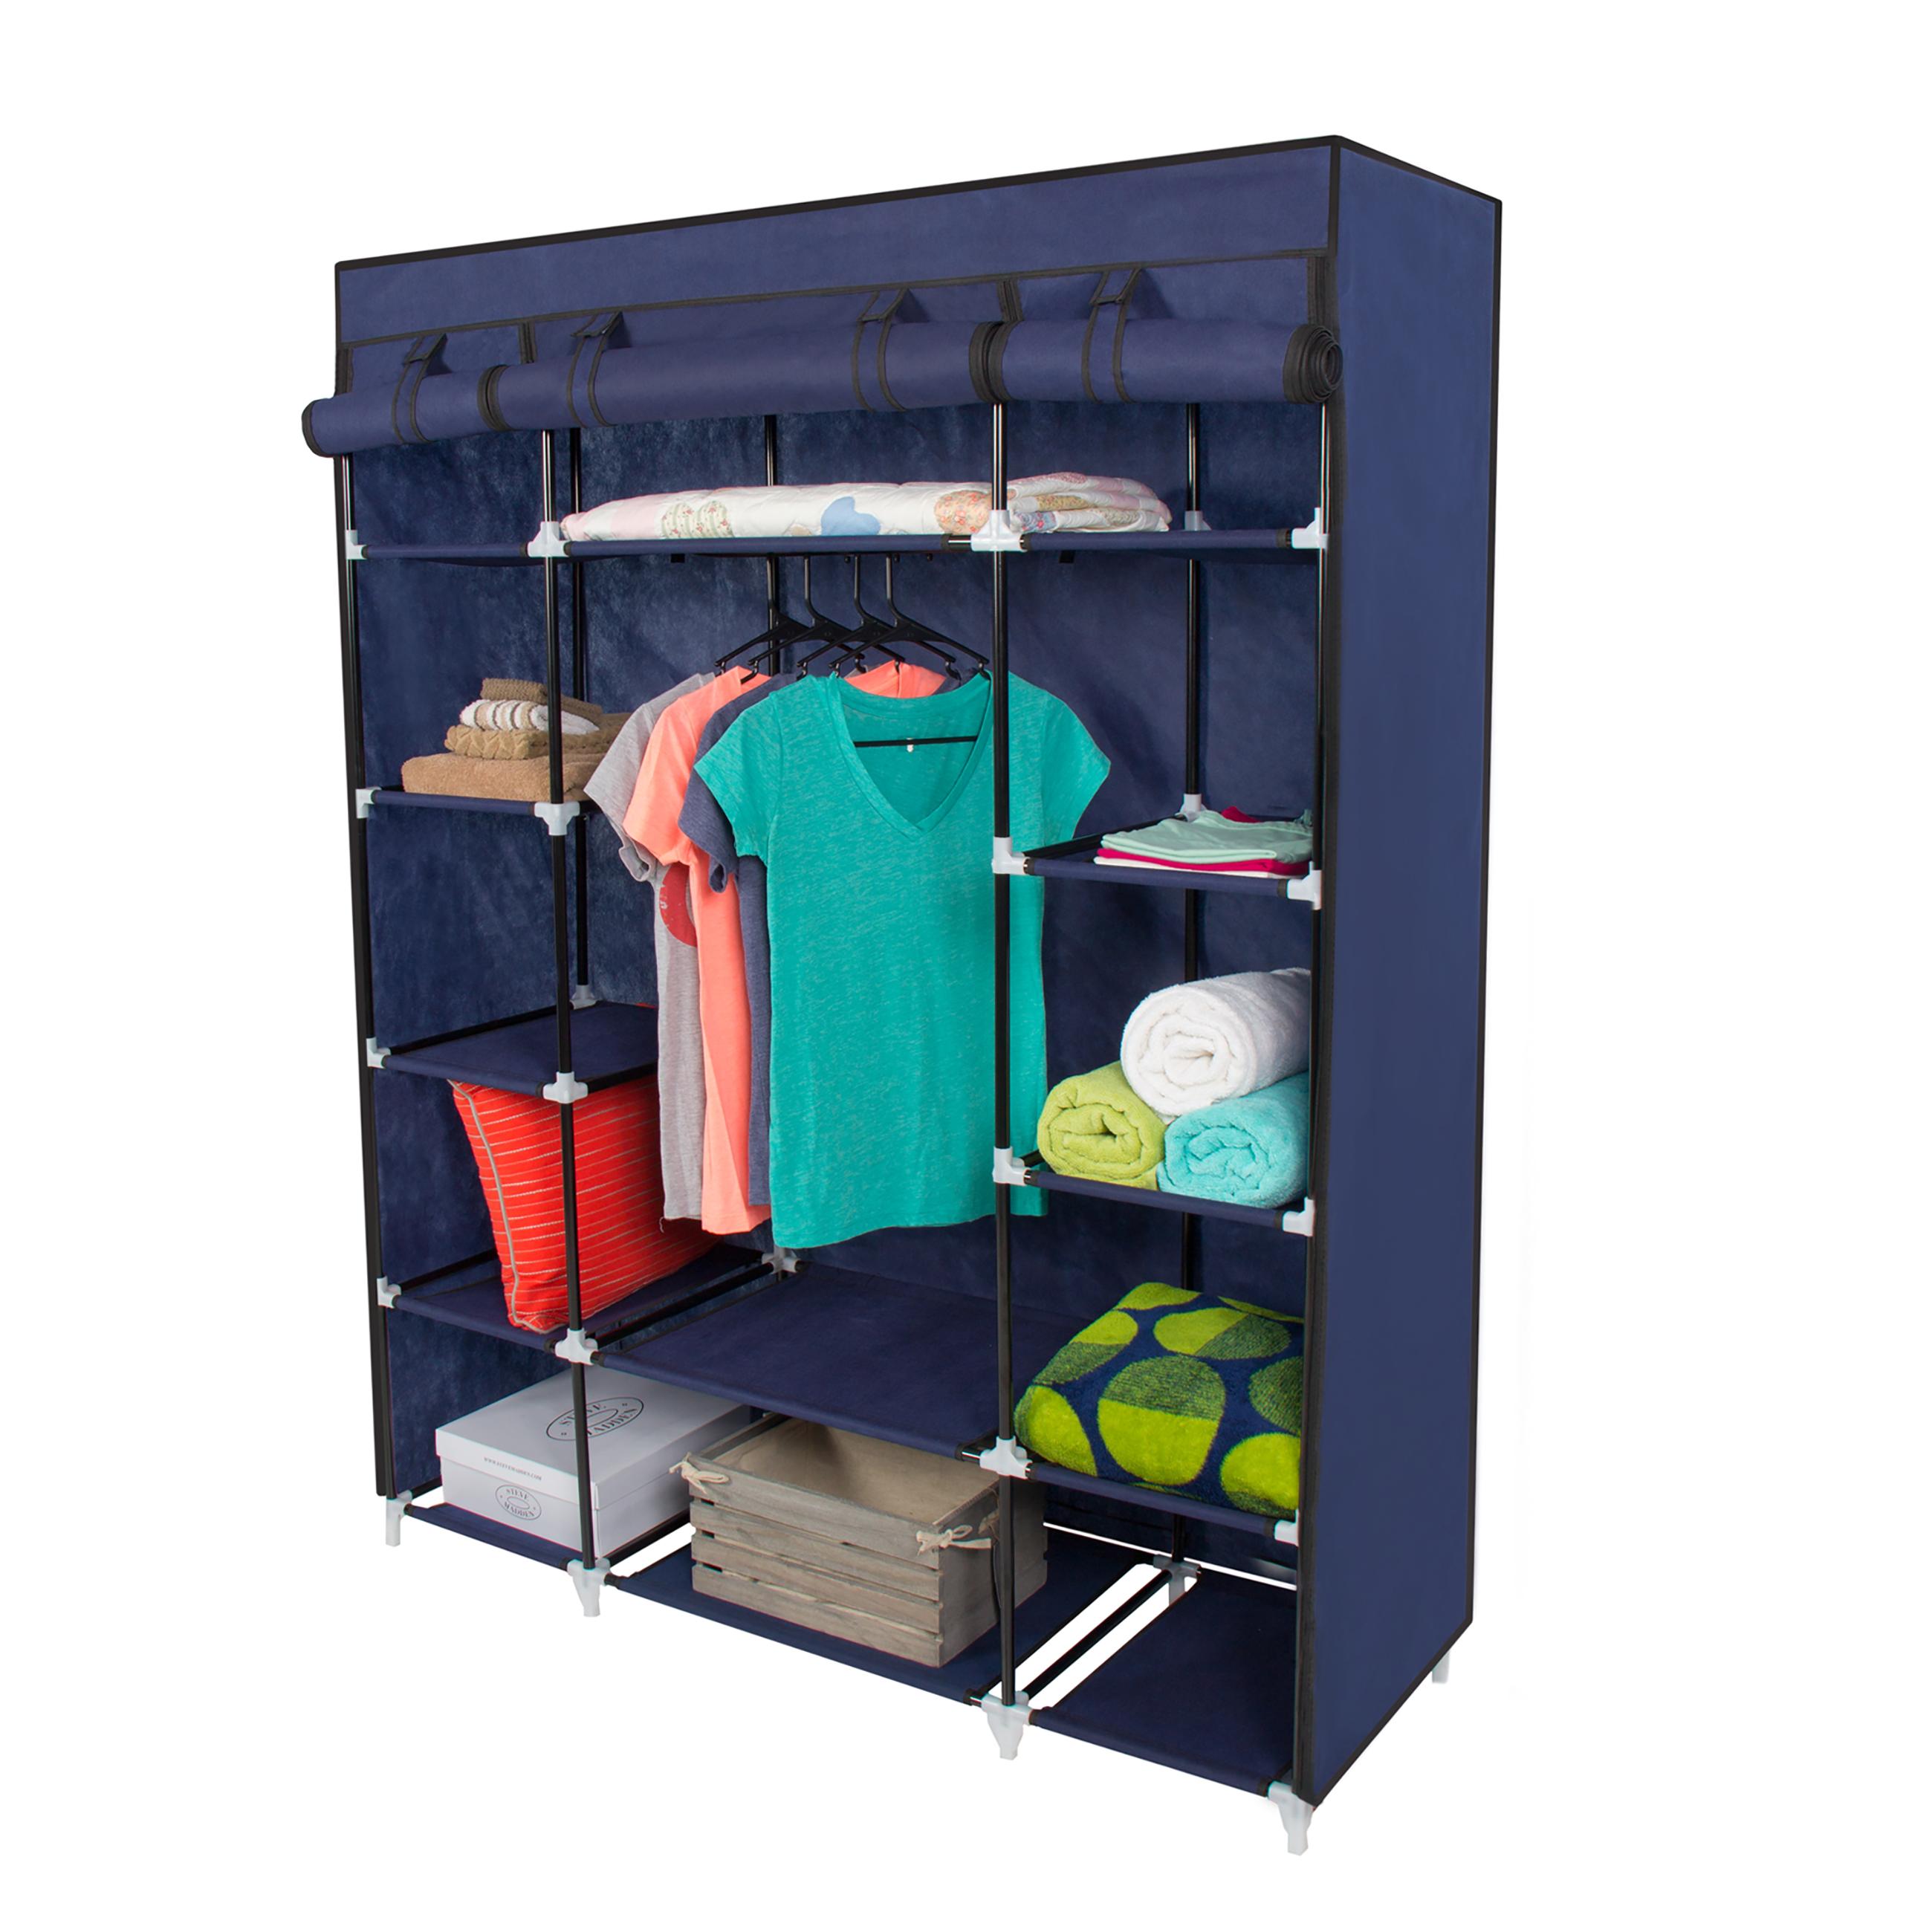 portable wardrobe 53u201d portable closet storage organizer wardrobe clothes rack with shelves  blue NJPBYQB